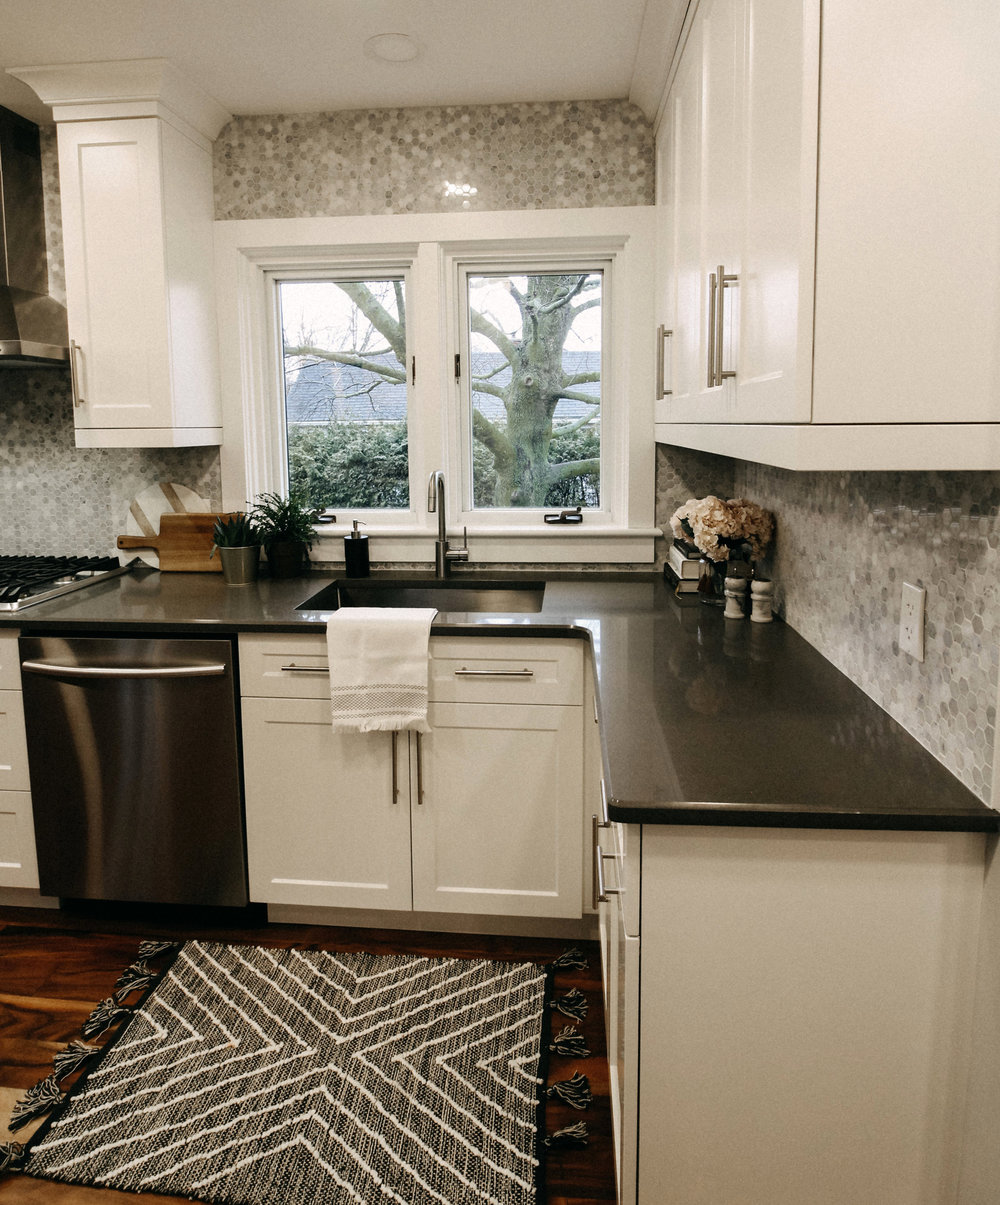 Palmer Kitchen Small Side Cabinets.jpg